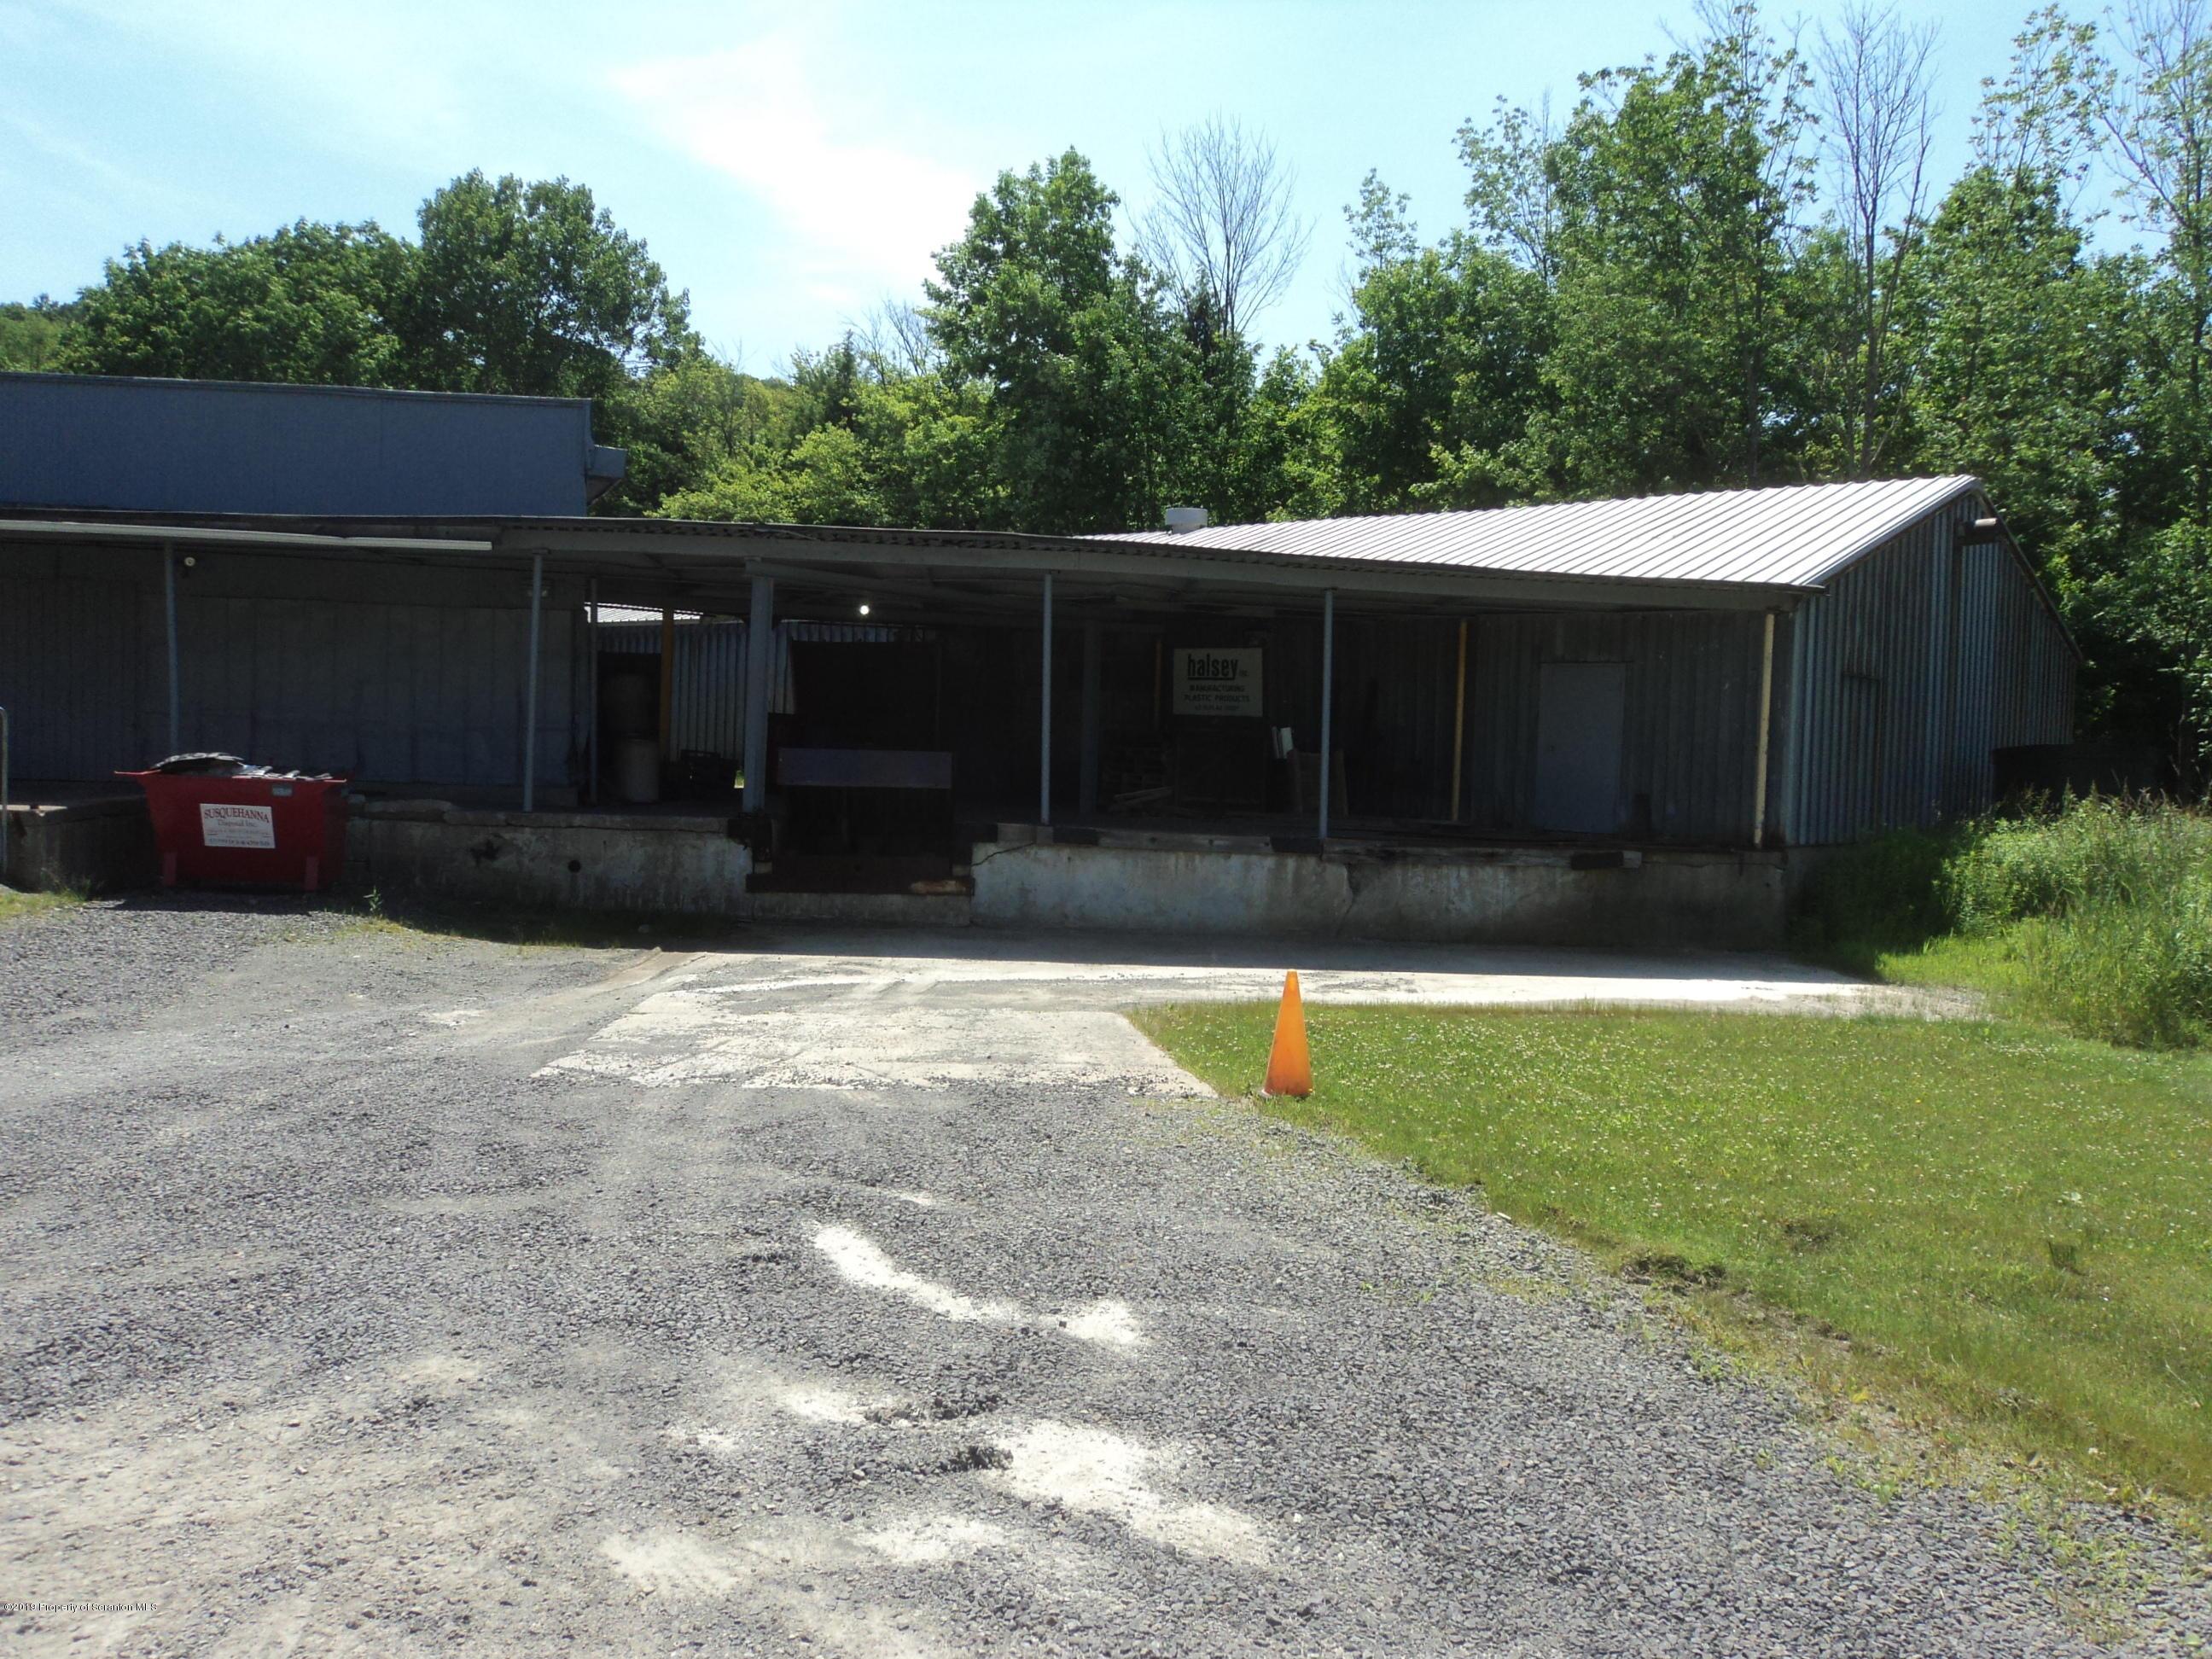 14348 SR 706, Montrose, Pennsylvania 18801, ,1 BathroomBathrooms,Commercial,For Sale,SR 706,19-2997